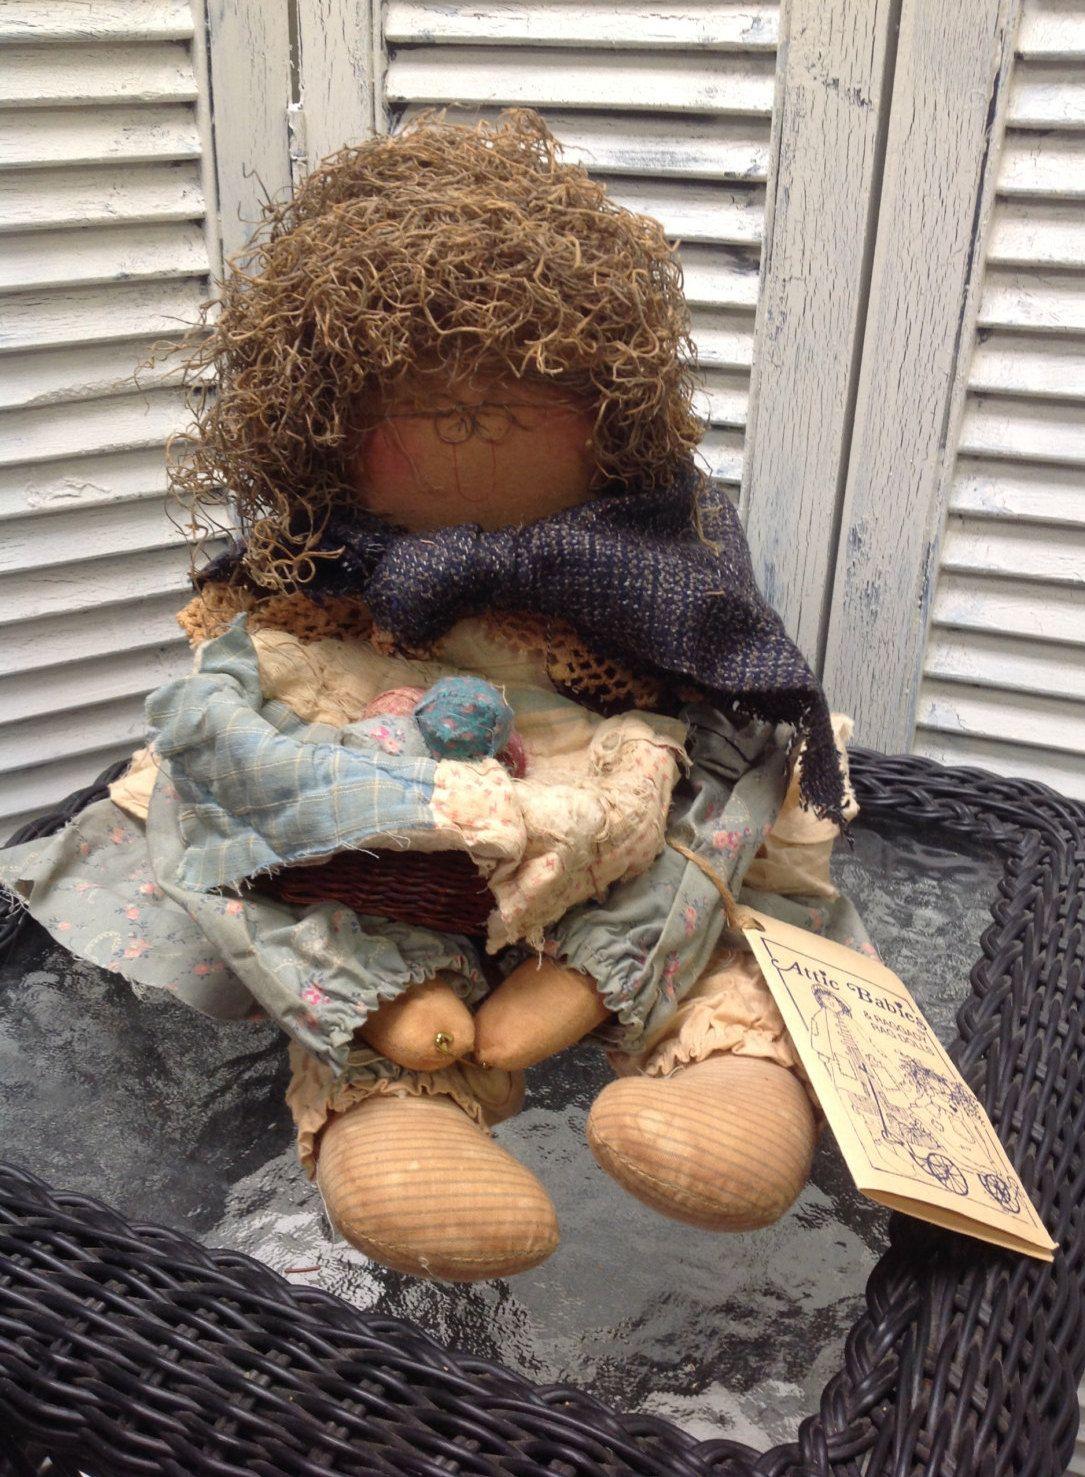 Vintage Attic Babies Granny Grunt Doll by Marty Maschino by GrandmaRietas onu2026 & Vintage Attic Babies Granny Grunt Doll by Marty Maschino by ...